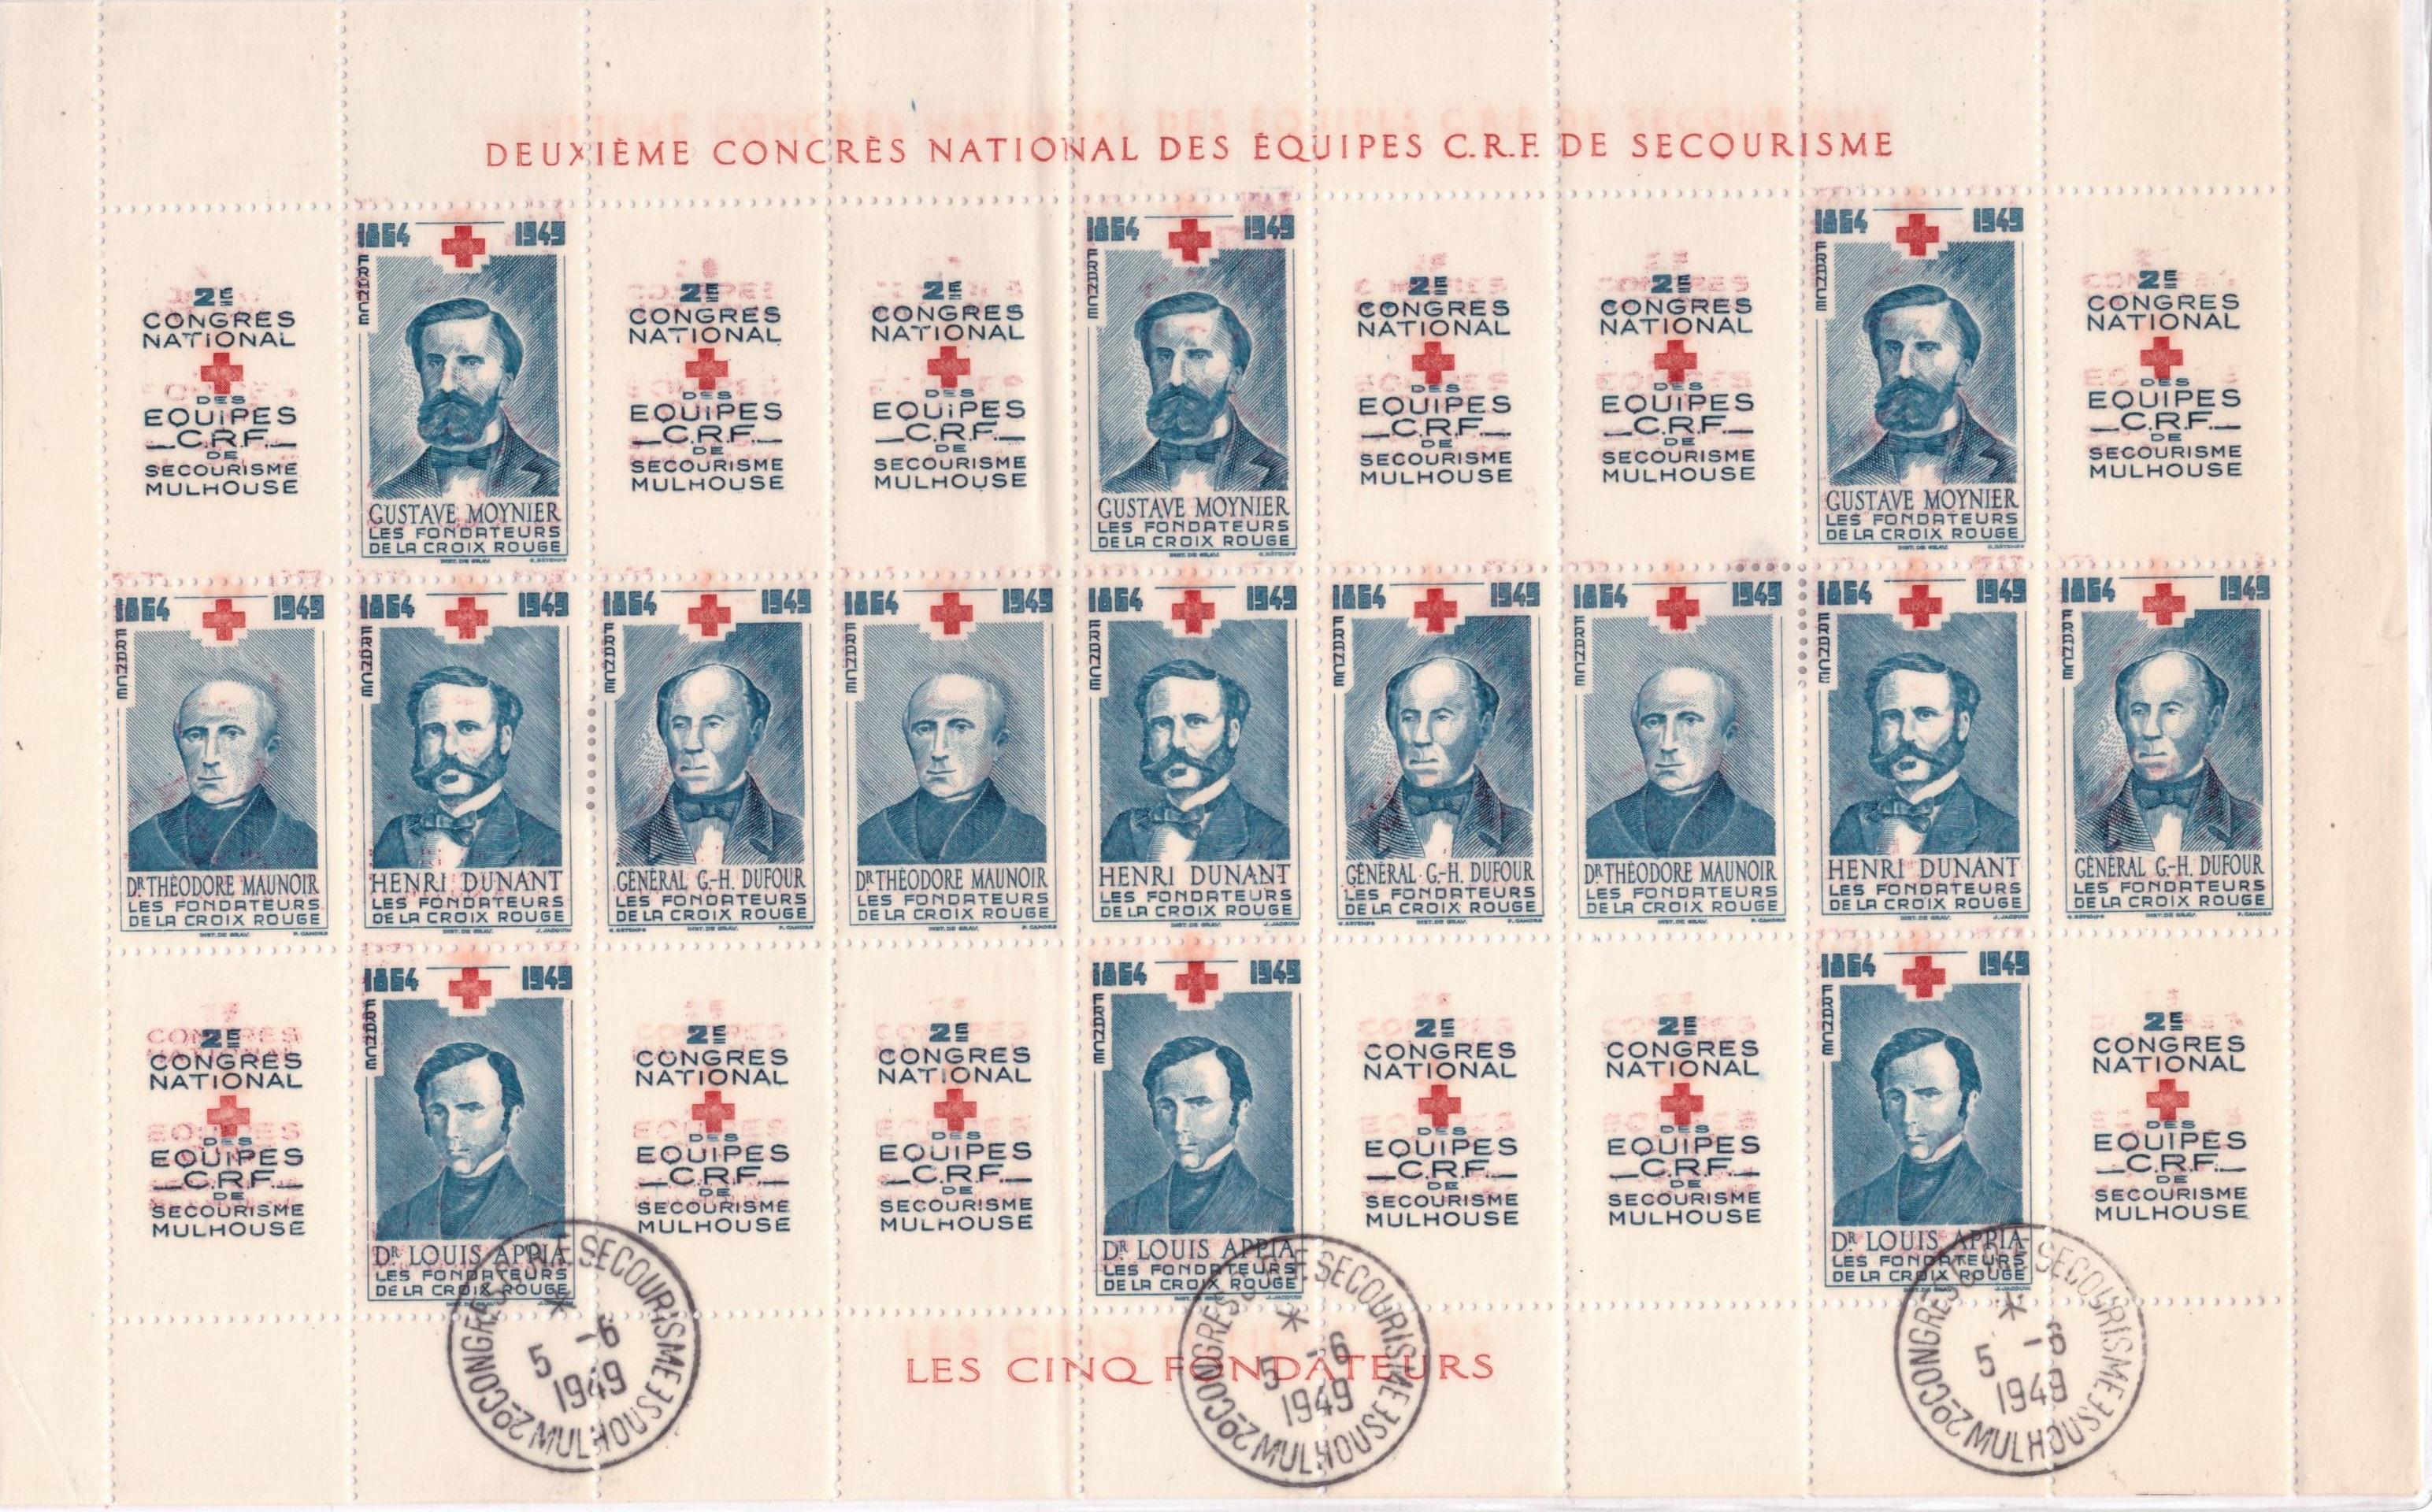 feuille_2_eme_congres_nationale_croix_rouge_1949_3.jpg